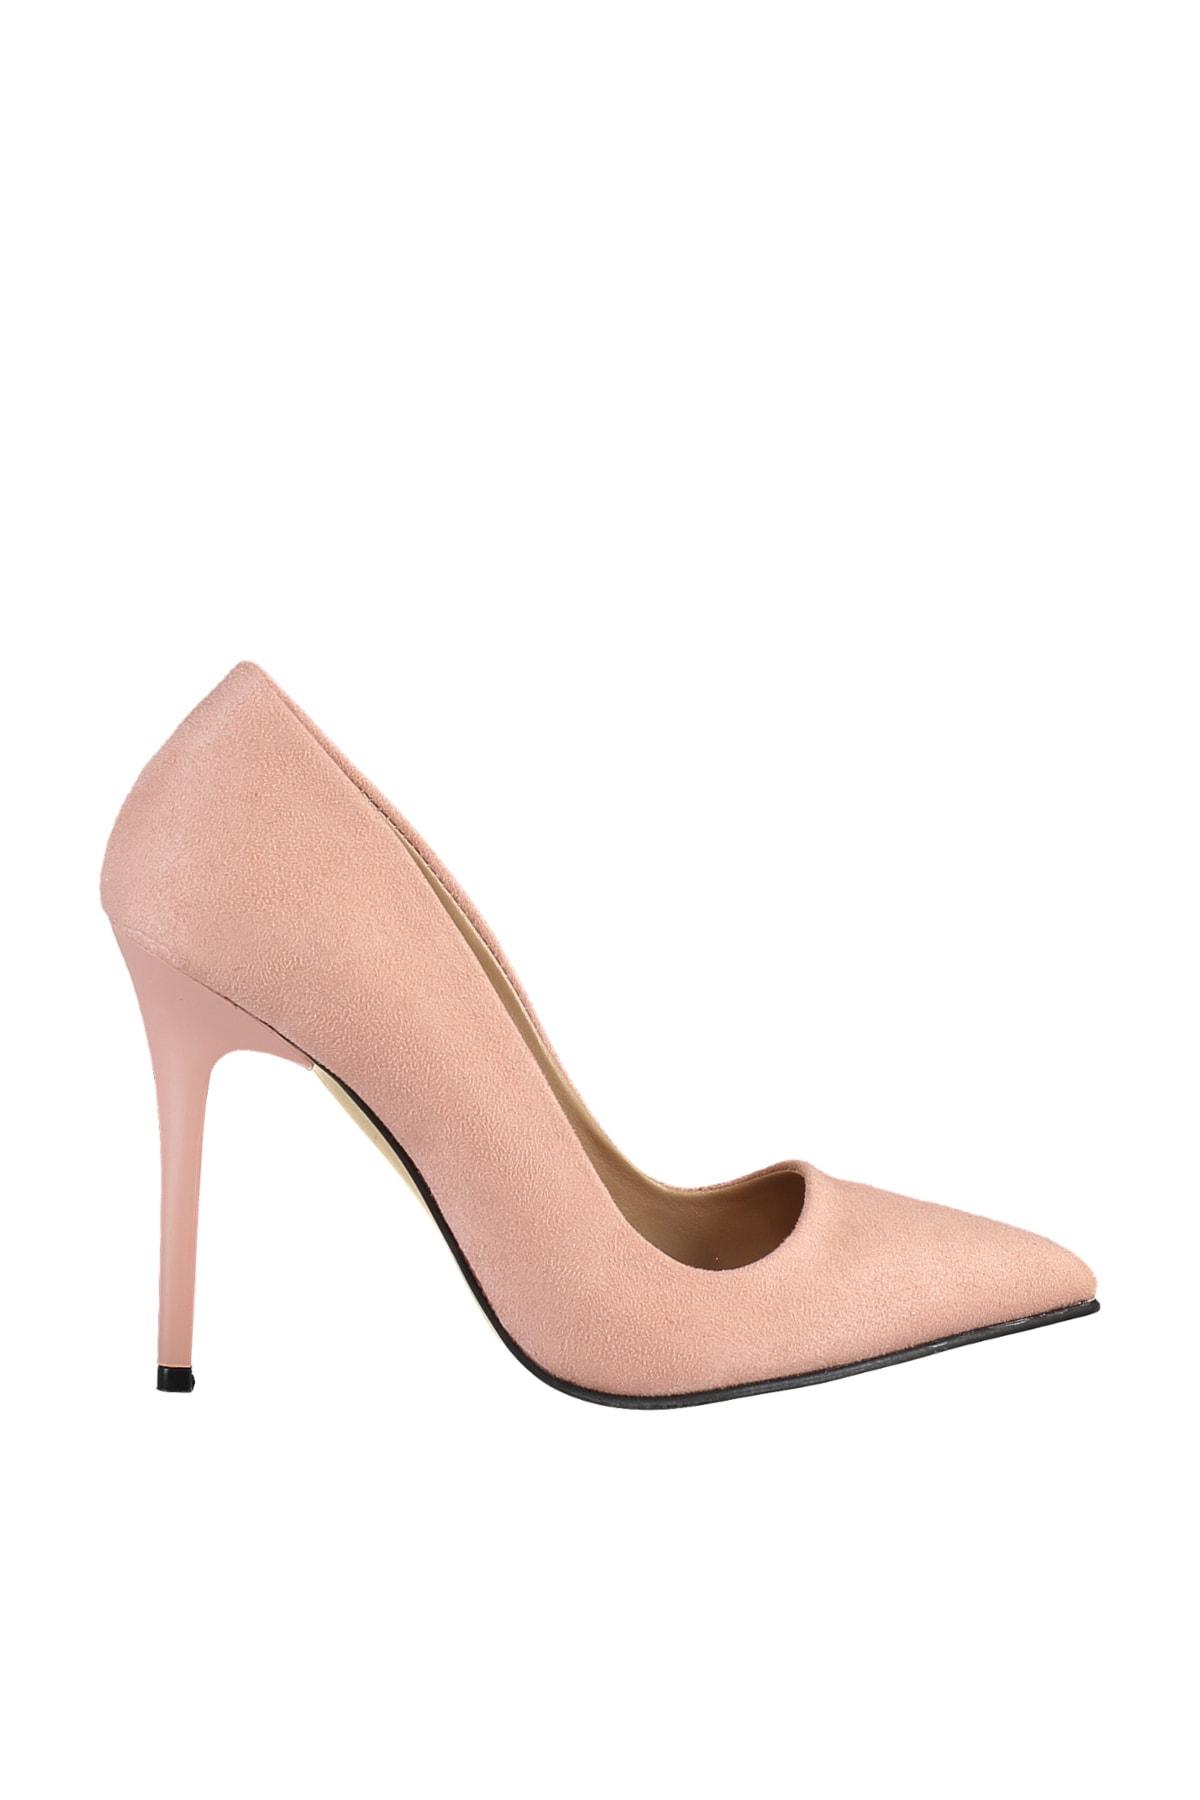 SOHO Pudra Suet Kadın Klasik Topuklu Ayakkabı 2